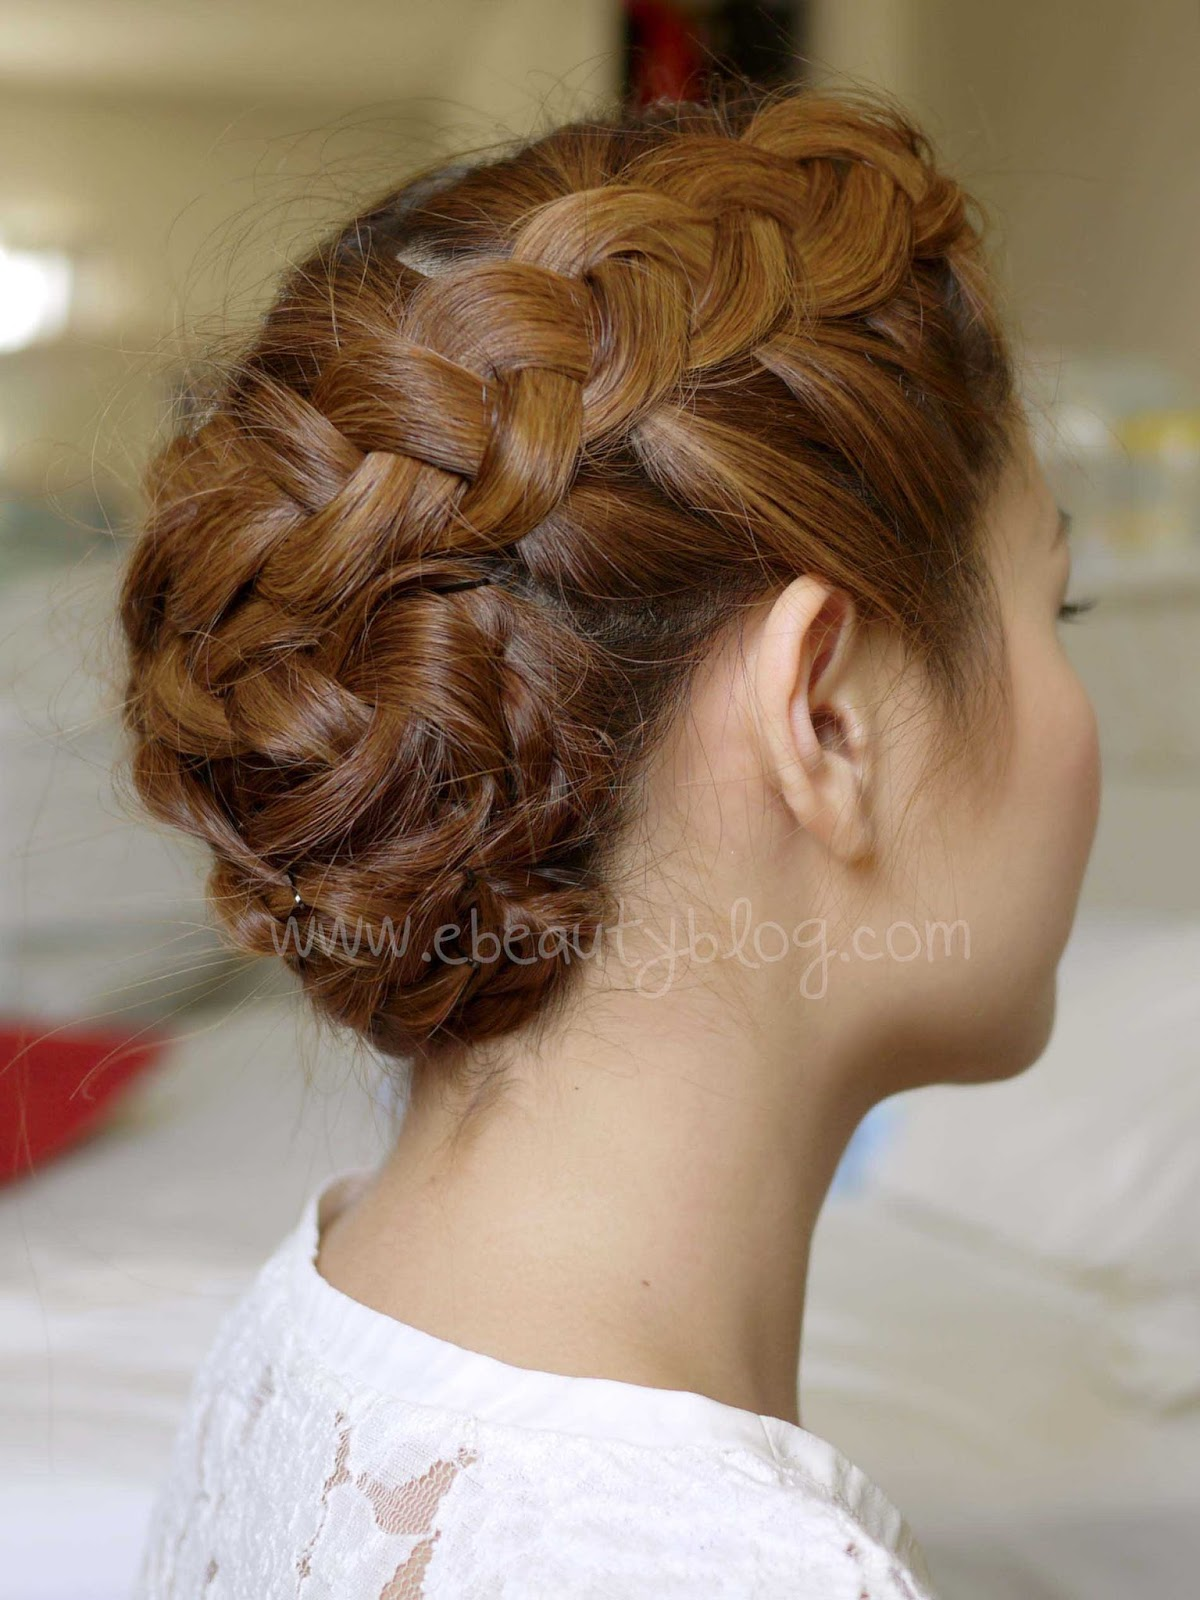 EbeautyBlog.com: Hair Tutorial: Summer Braided Updo